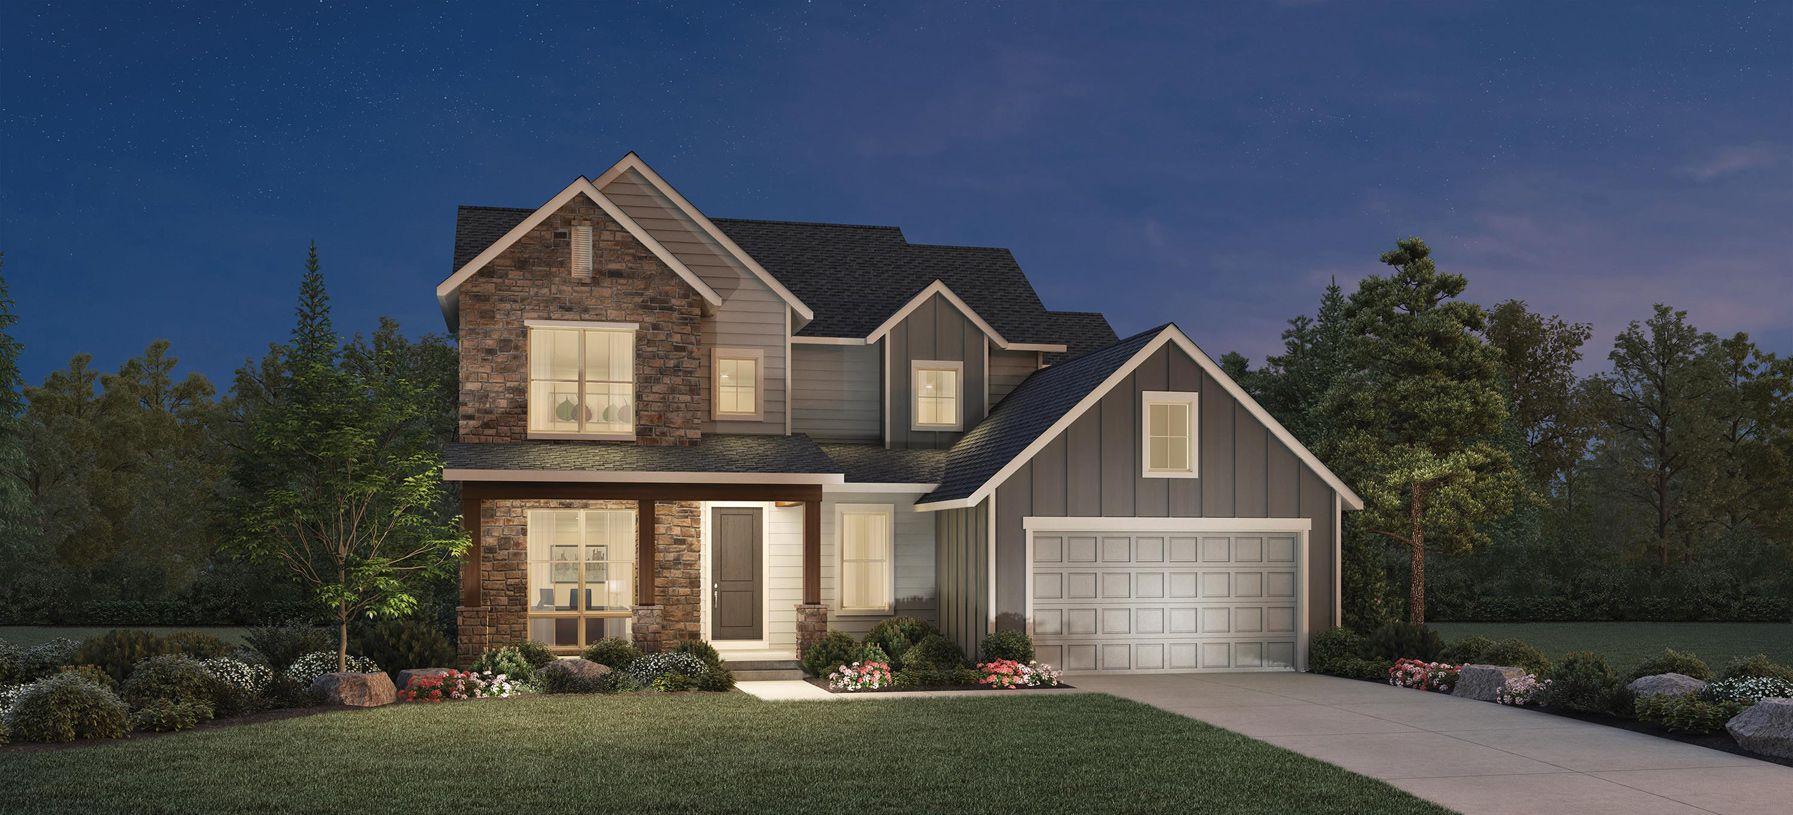 Elevation Image:The Modern Farmhouse